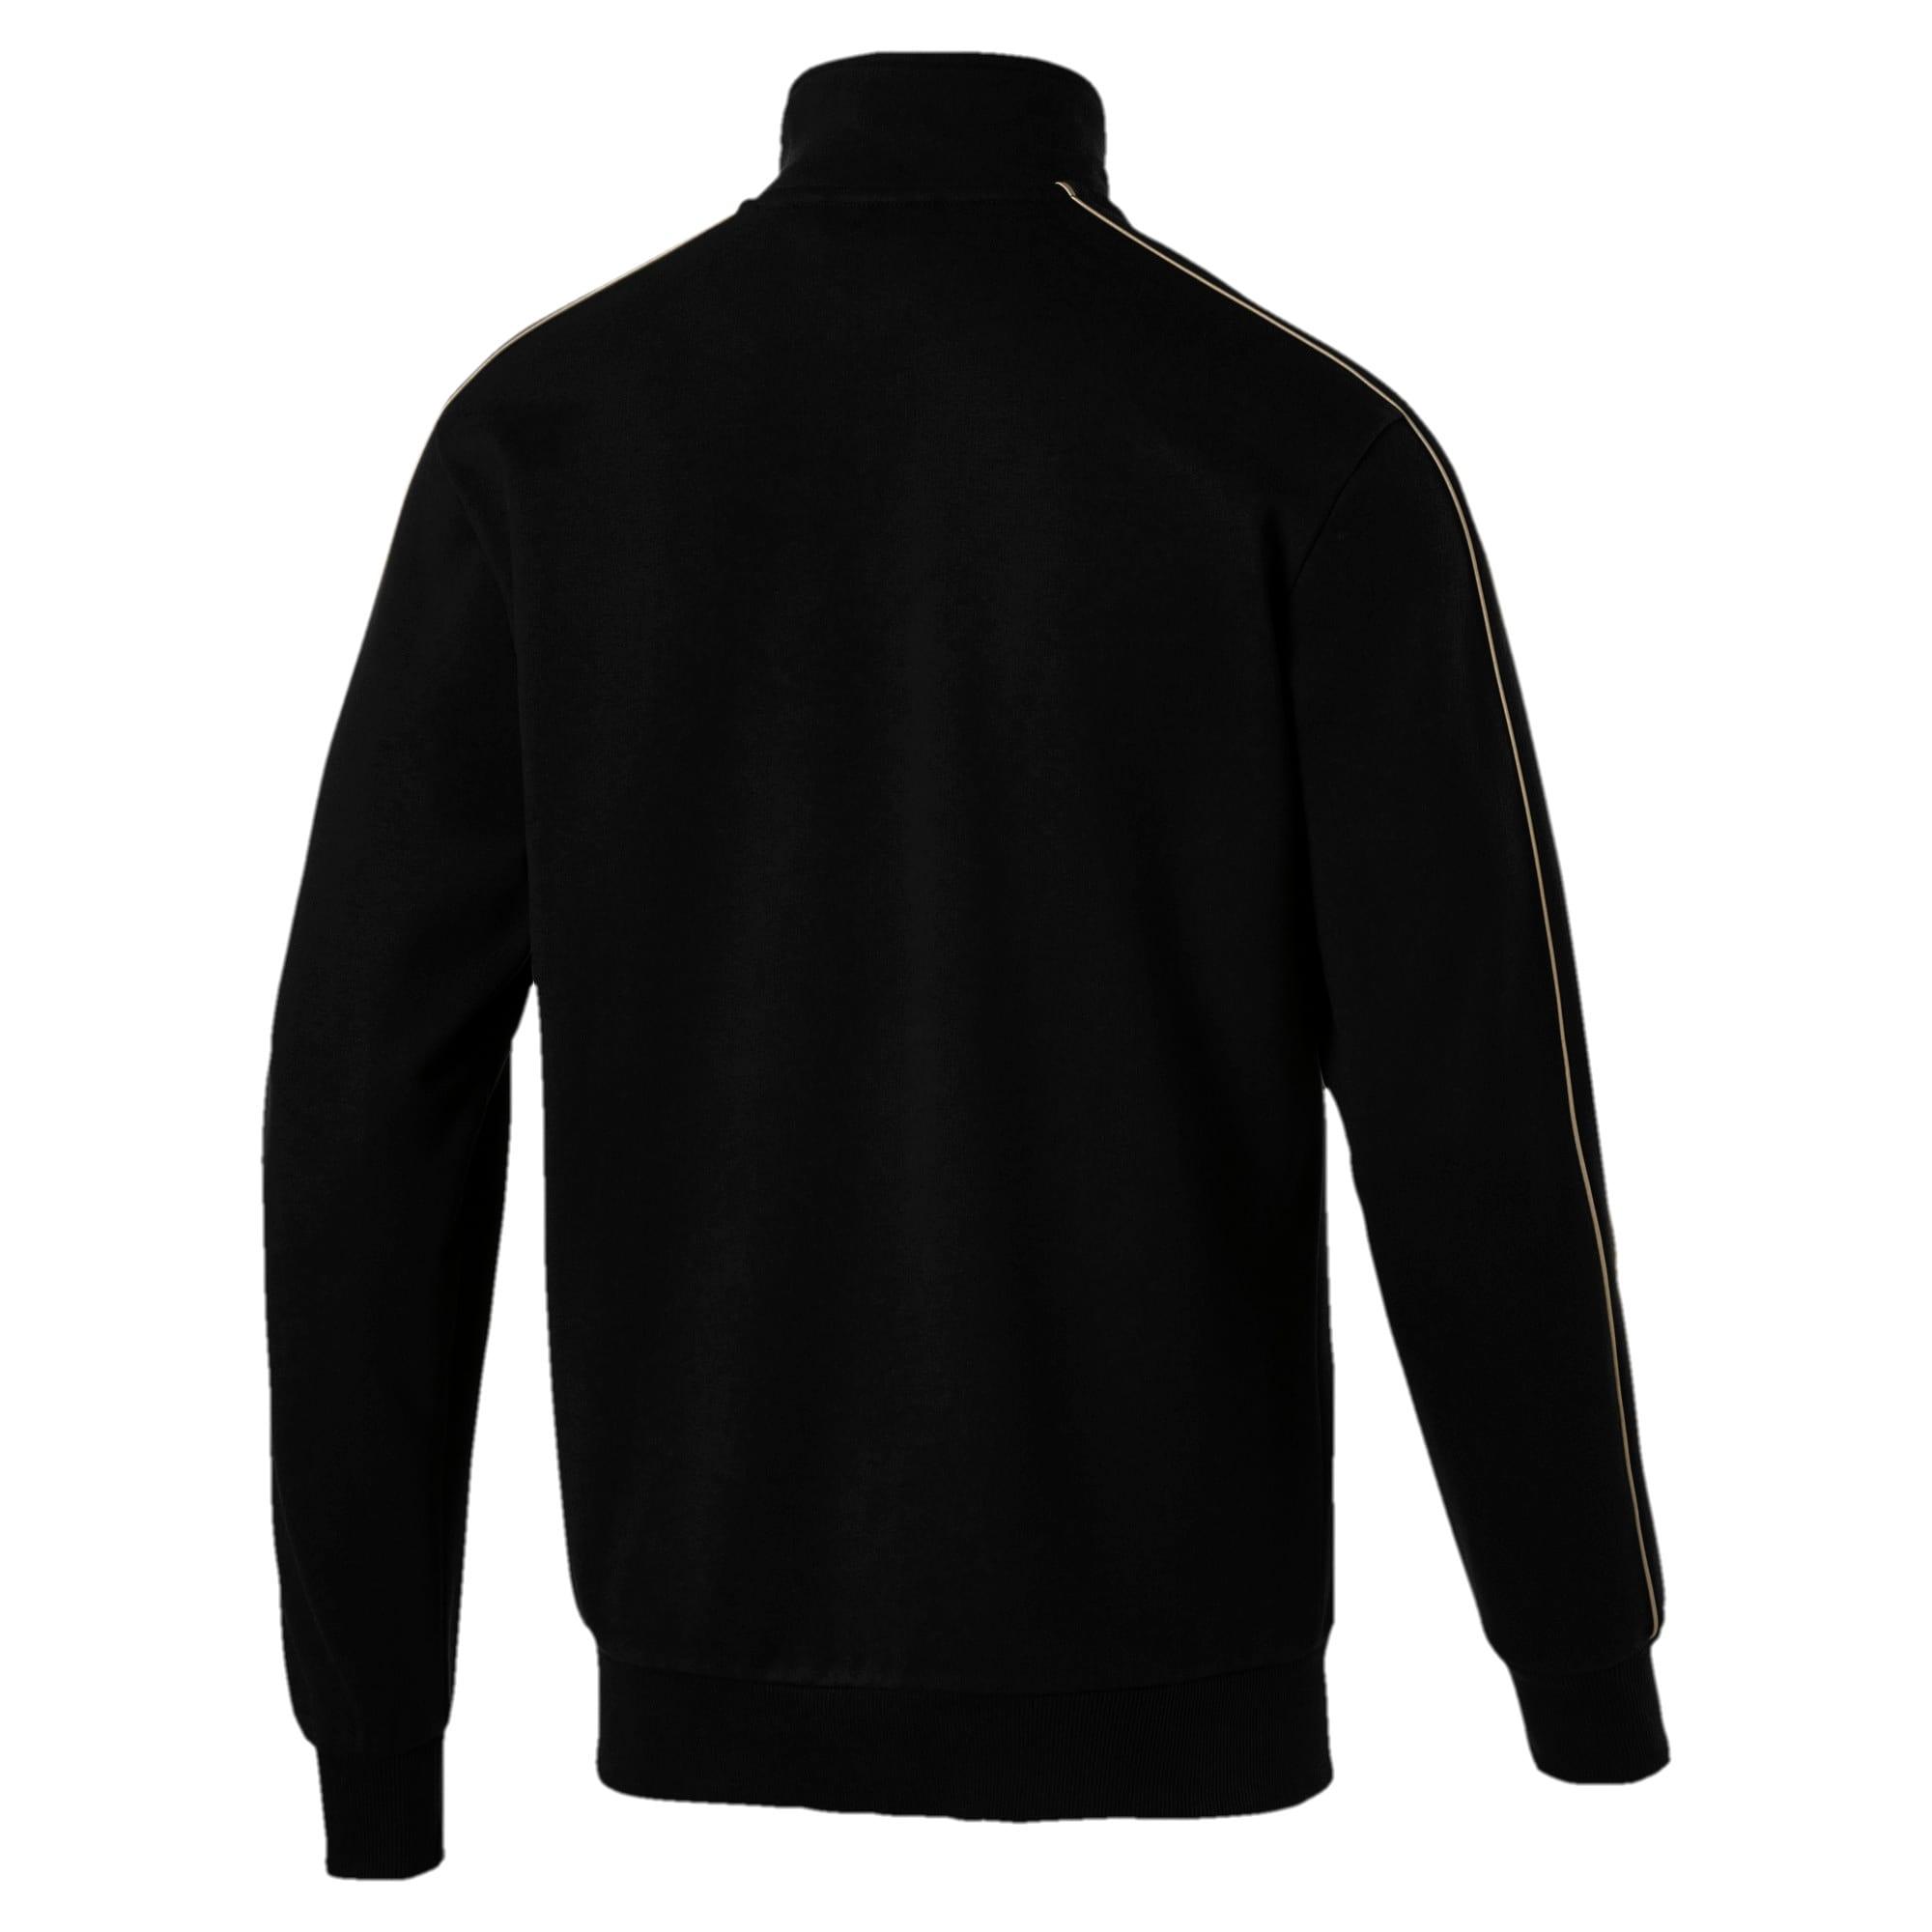 Thumbnail 2 of Chains T7 Zip-Up Men's Jacket, Puma Black, medium